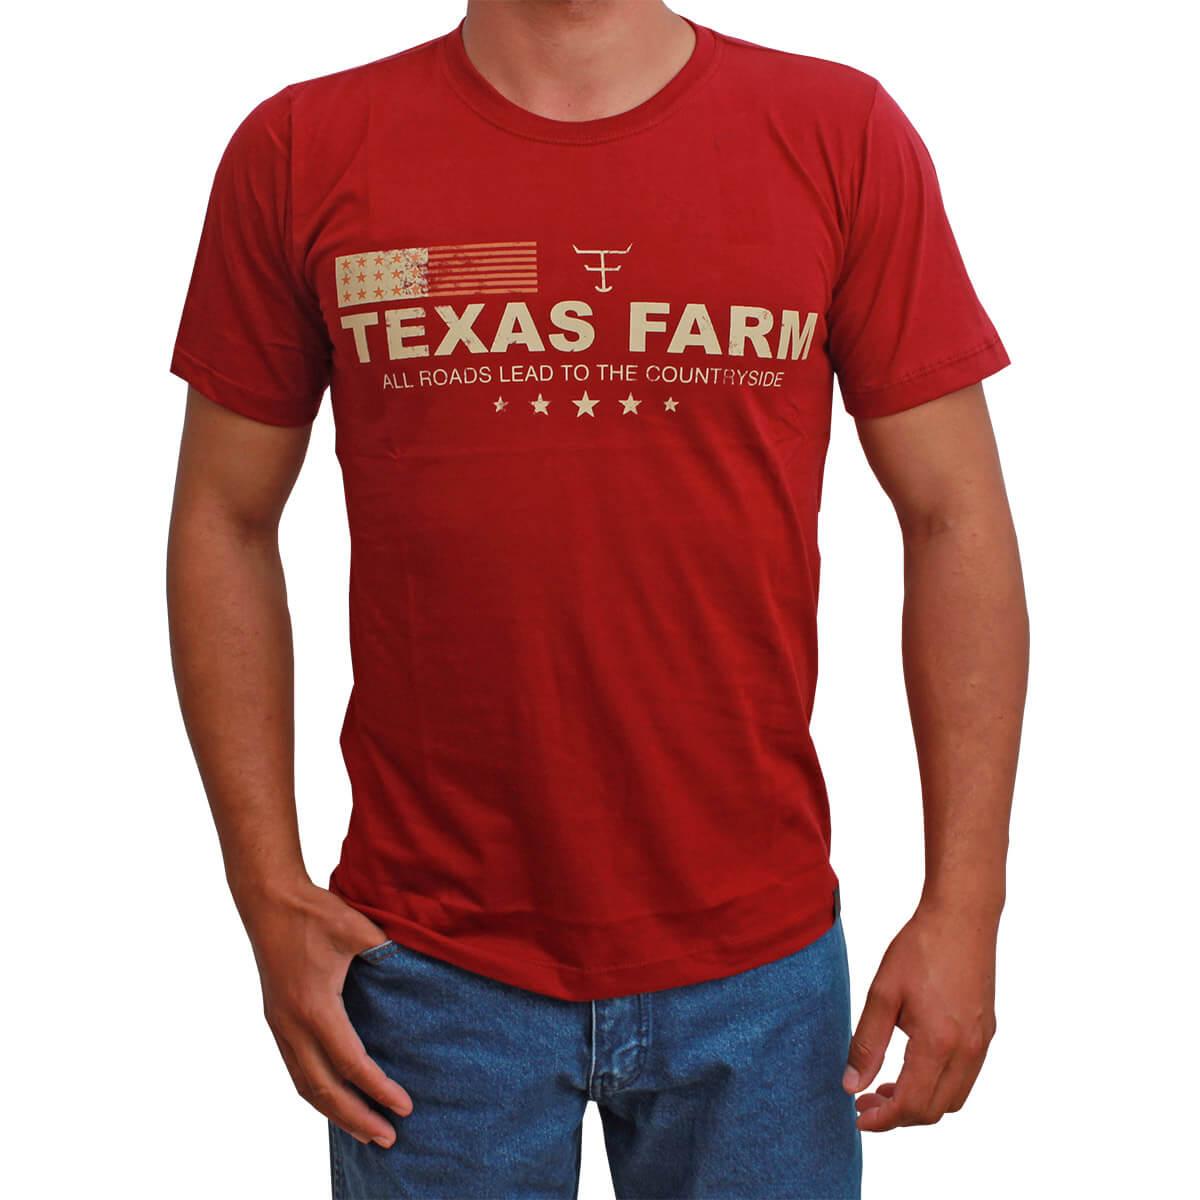 Camiseta Masculina Texas Farm Vermelha Lead To The